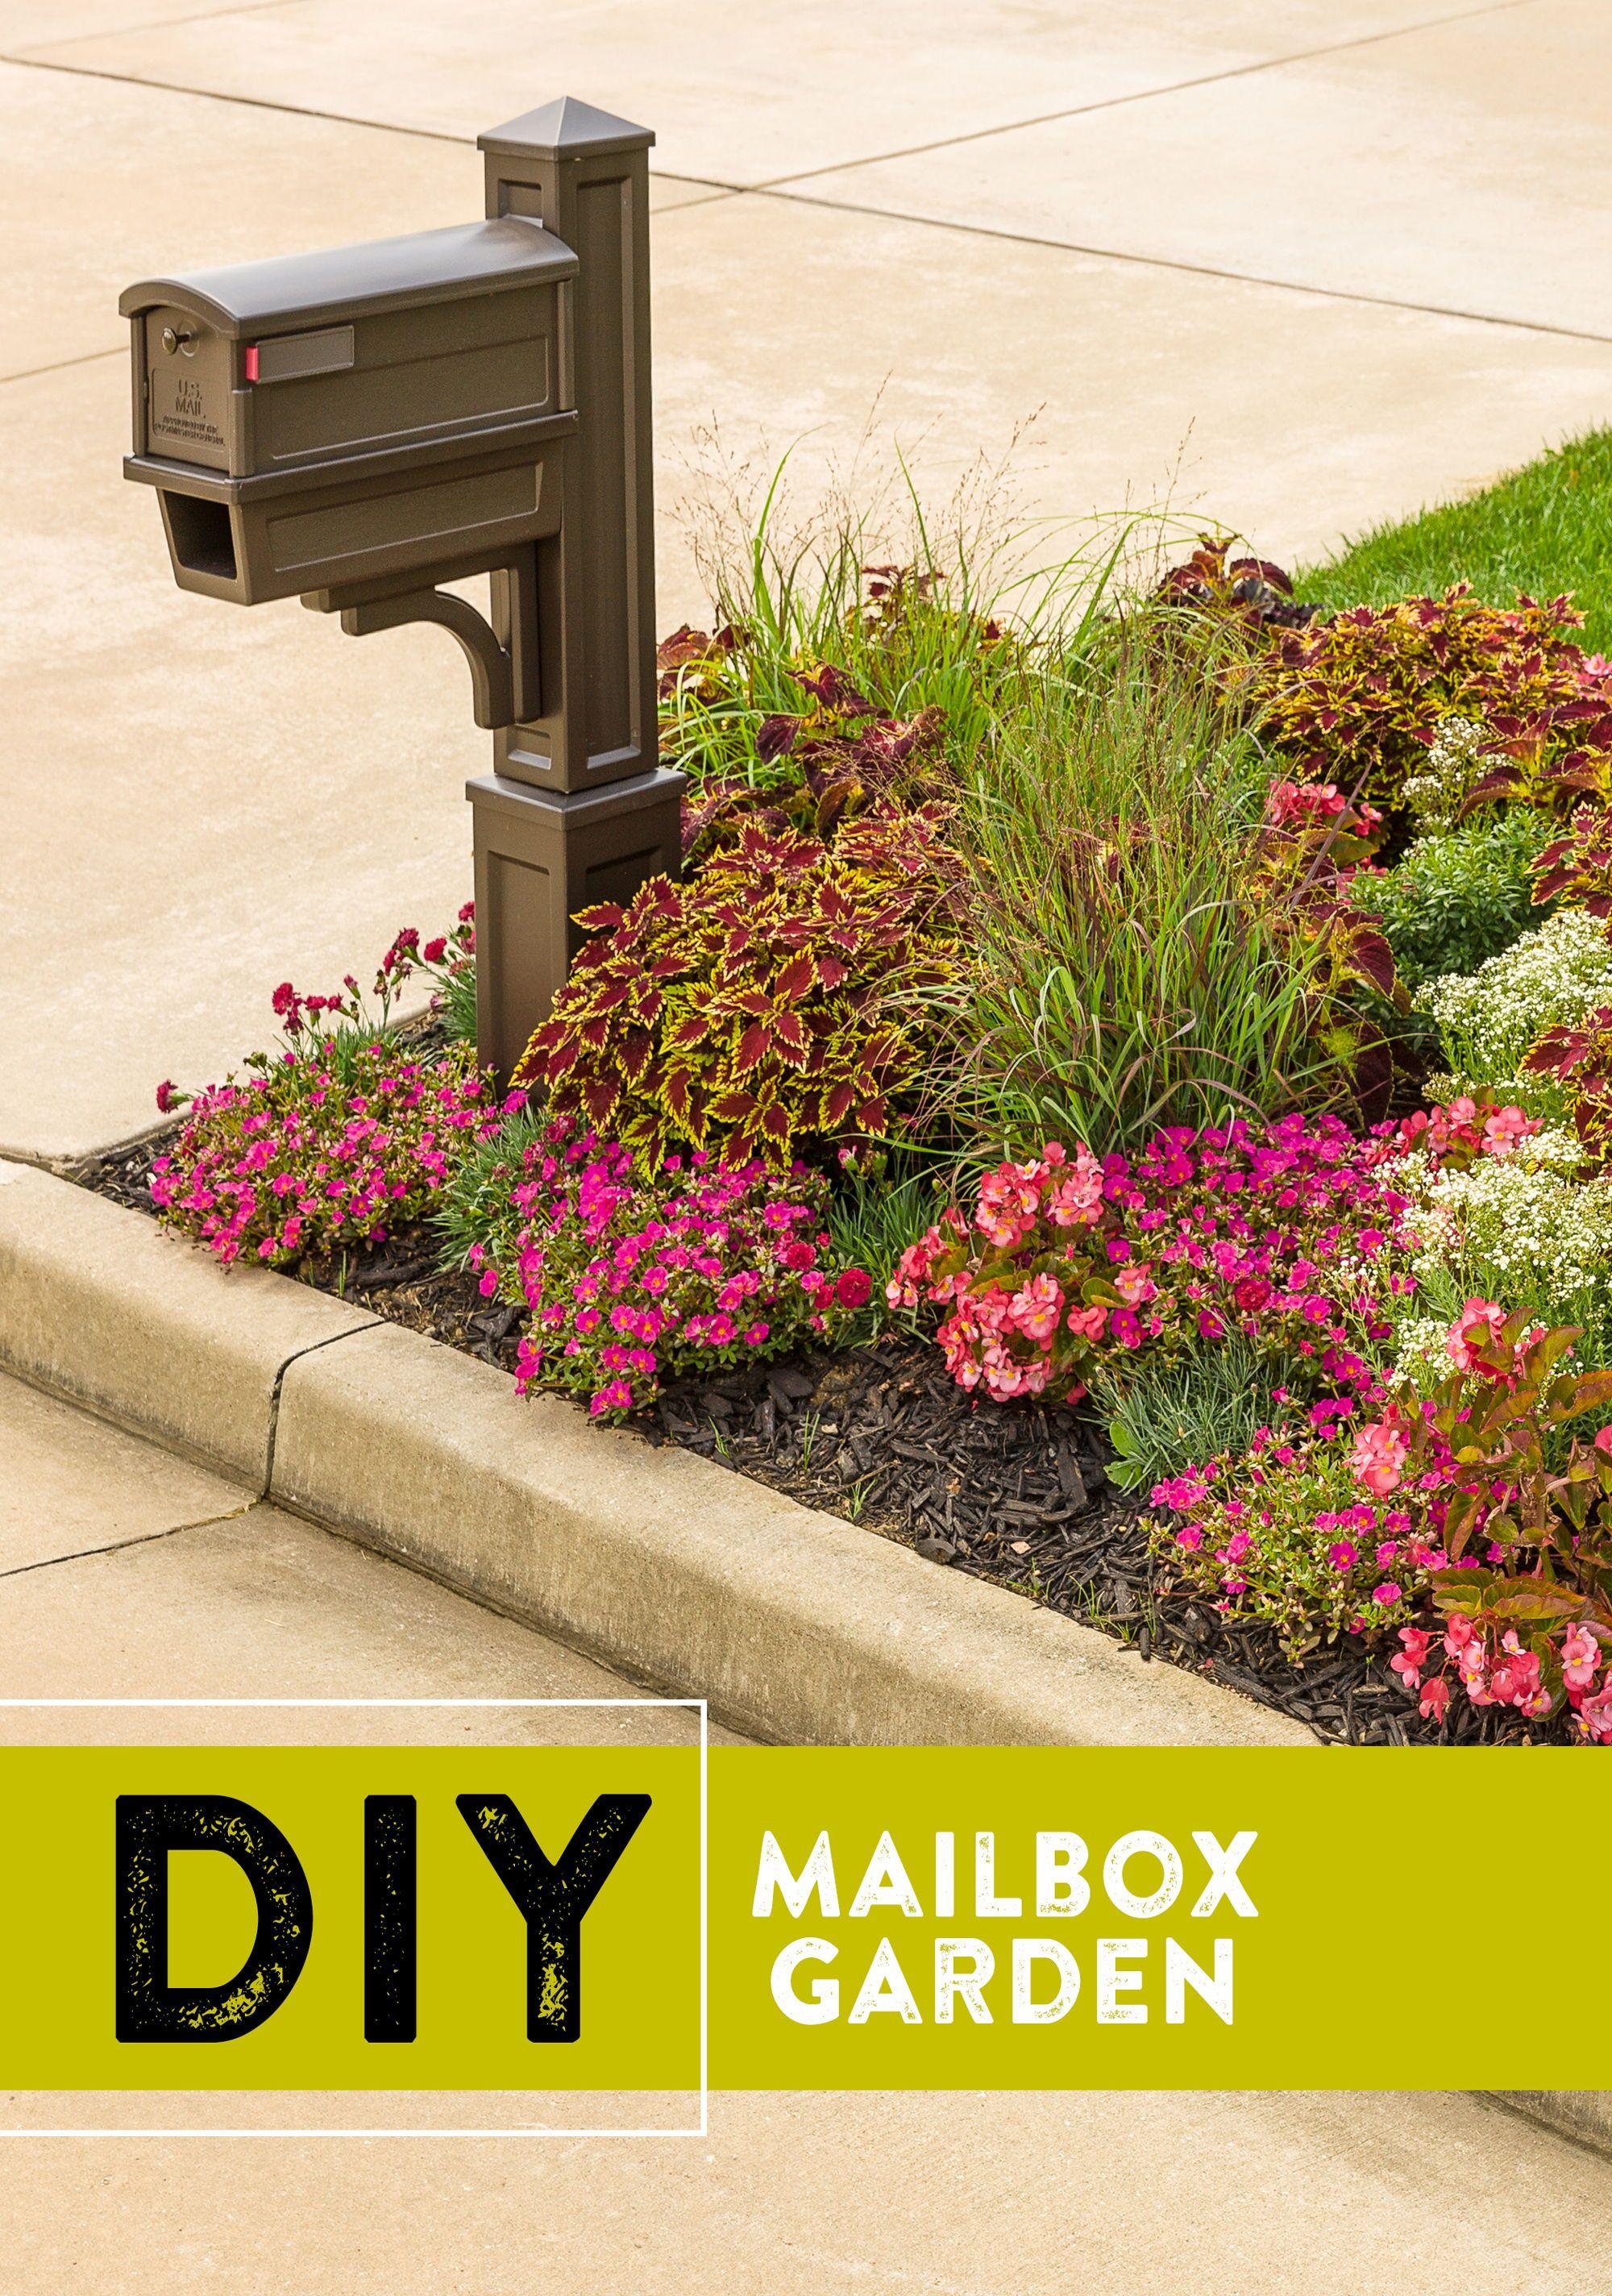 mailbox-garden - Proven Beauty